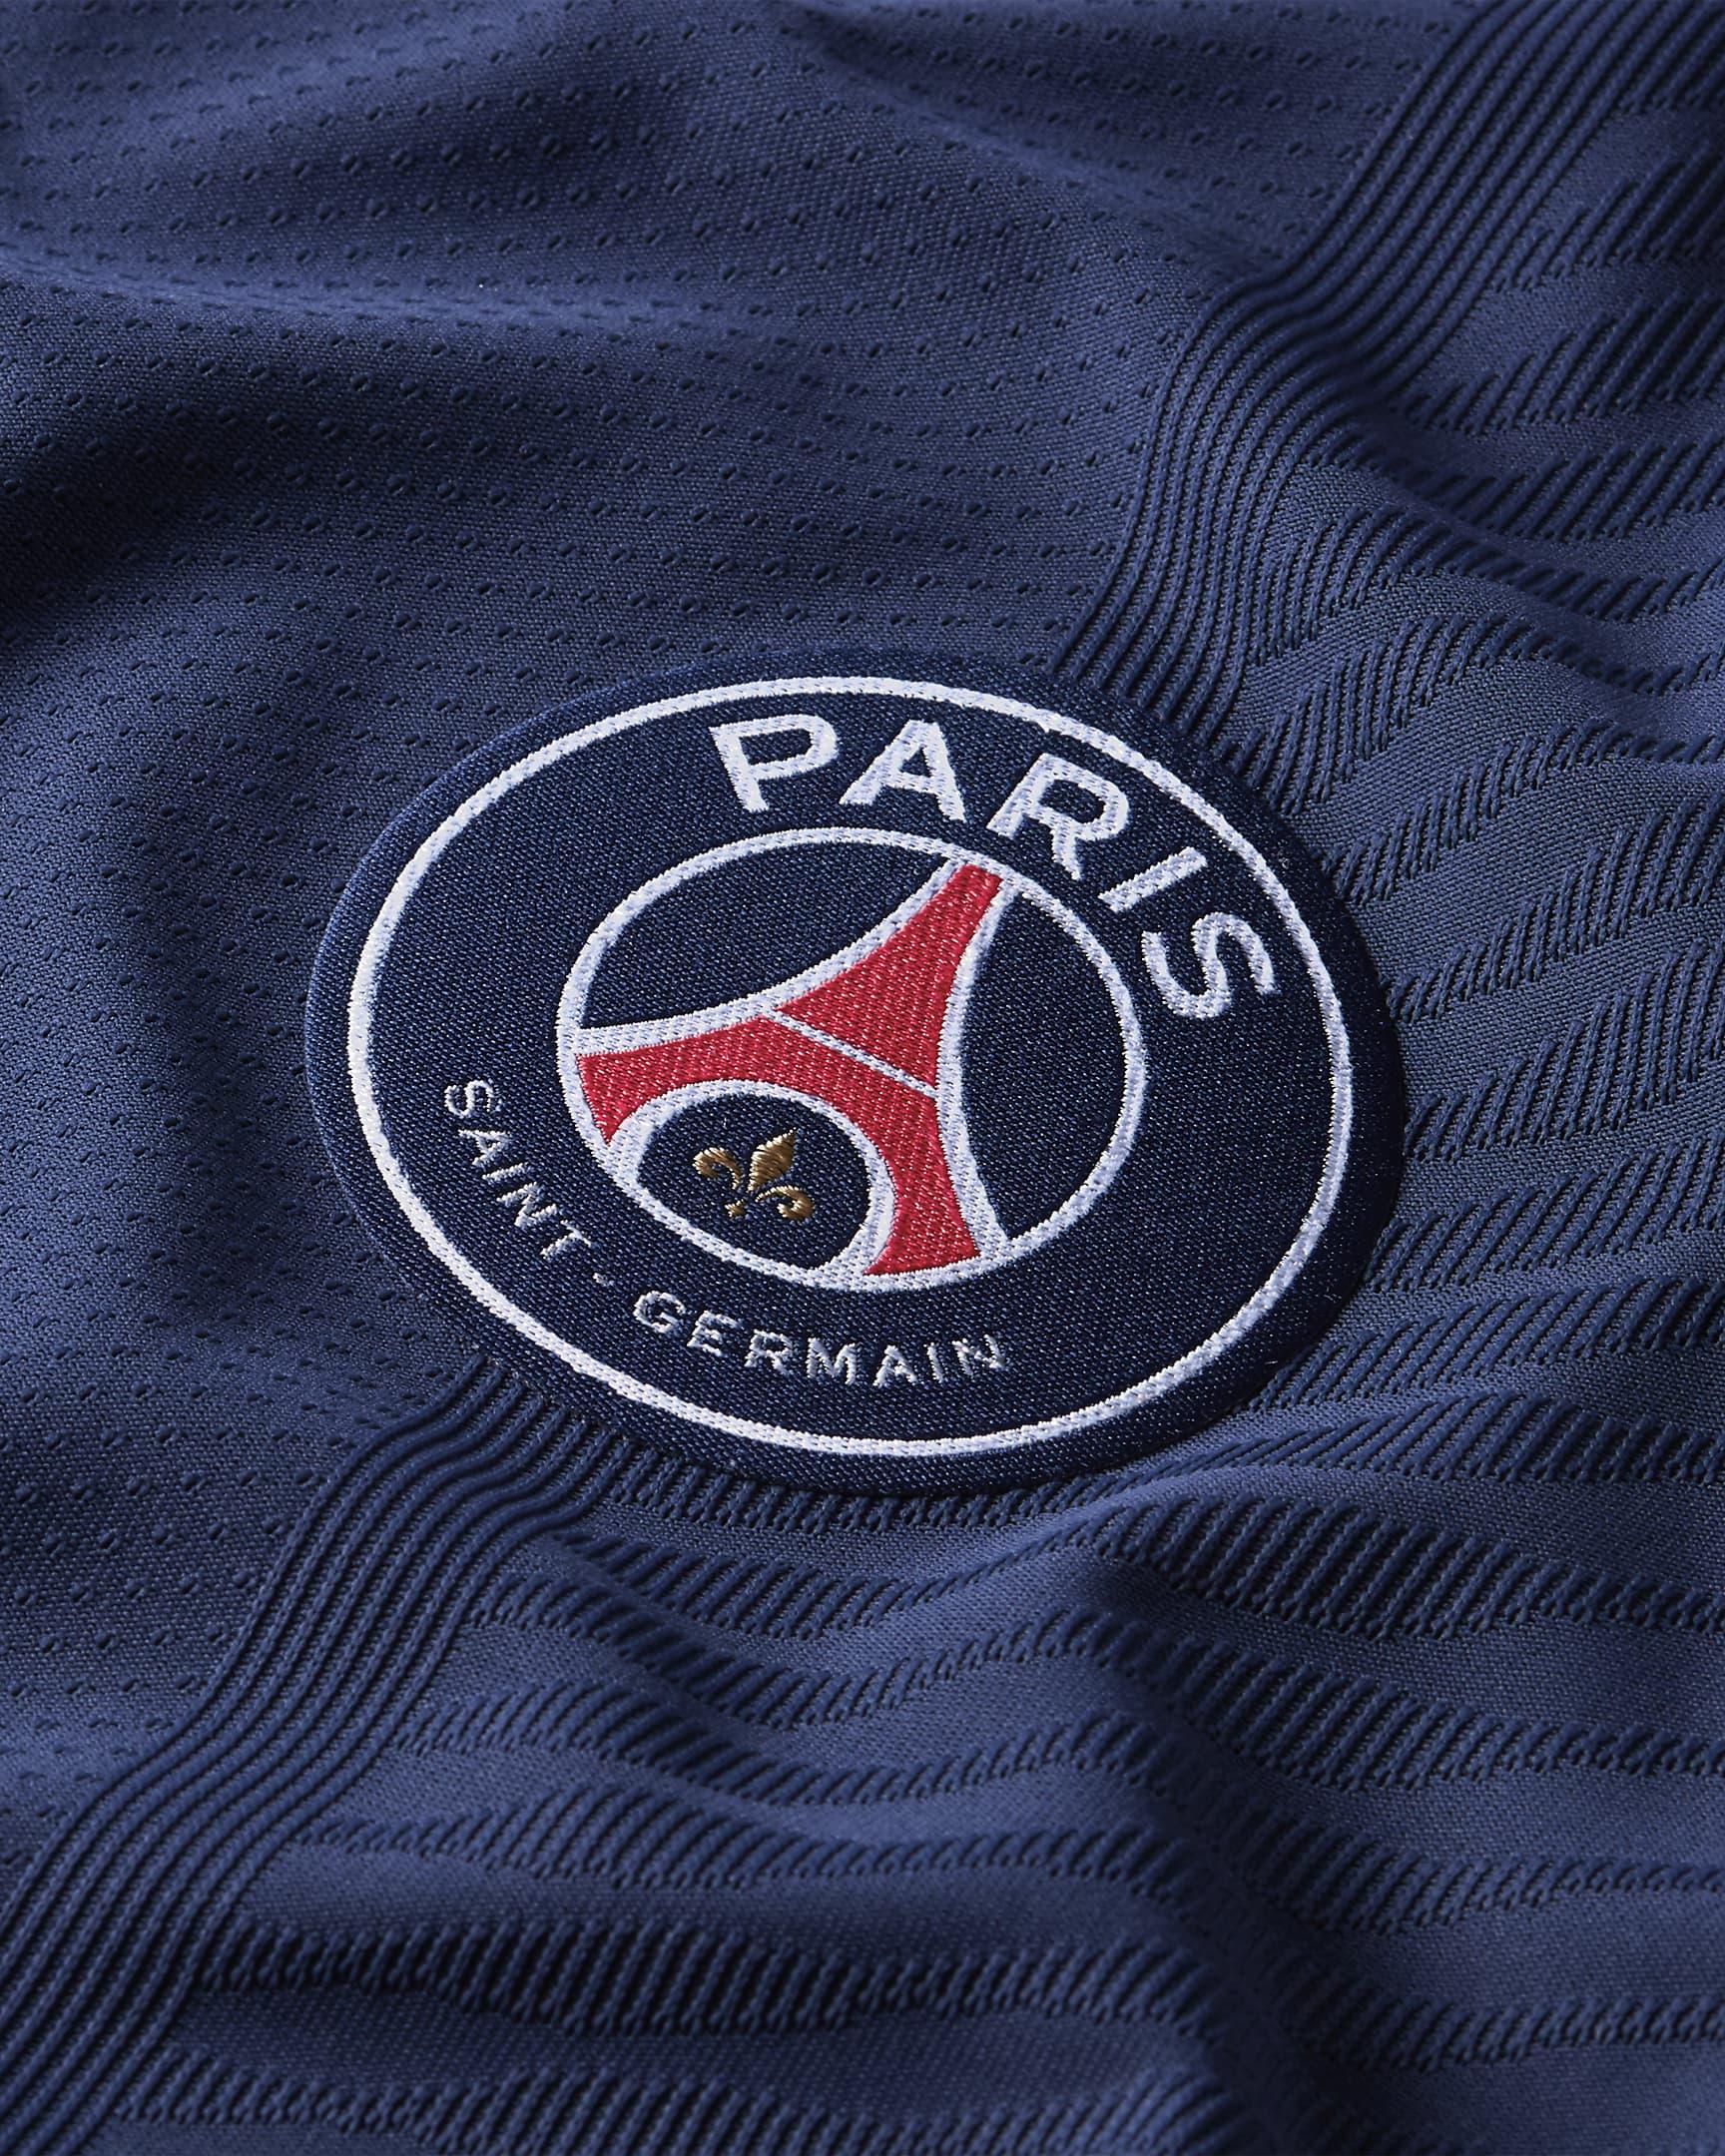 paris-saint-germain-2021-22-match-home-mens-dri-fit-adv-soccer-jersey-BN4sFV-1.png